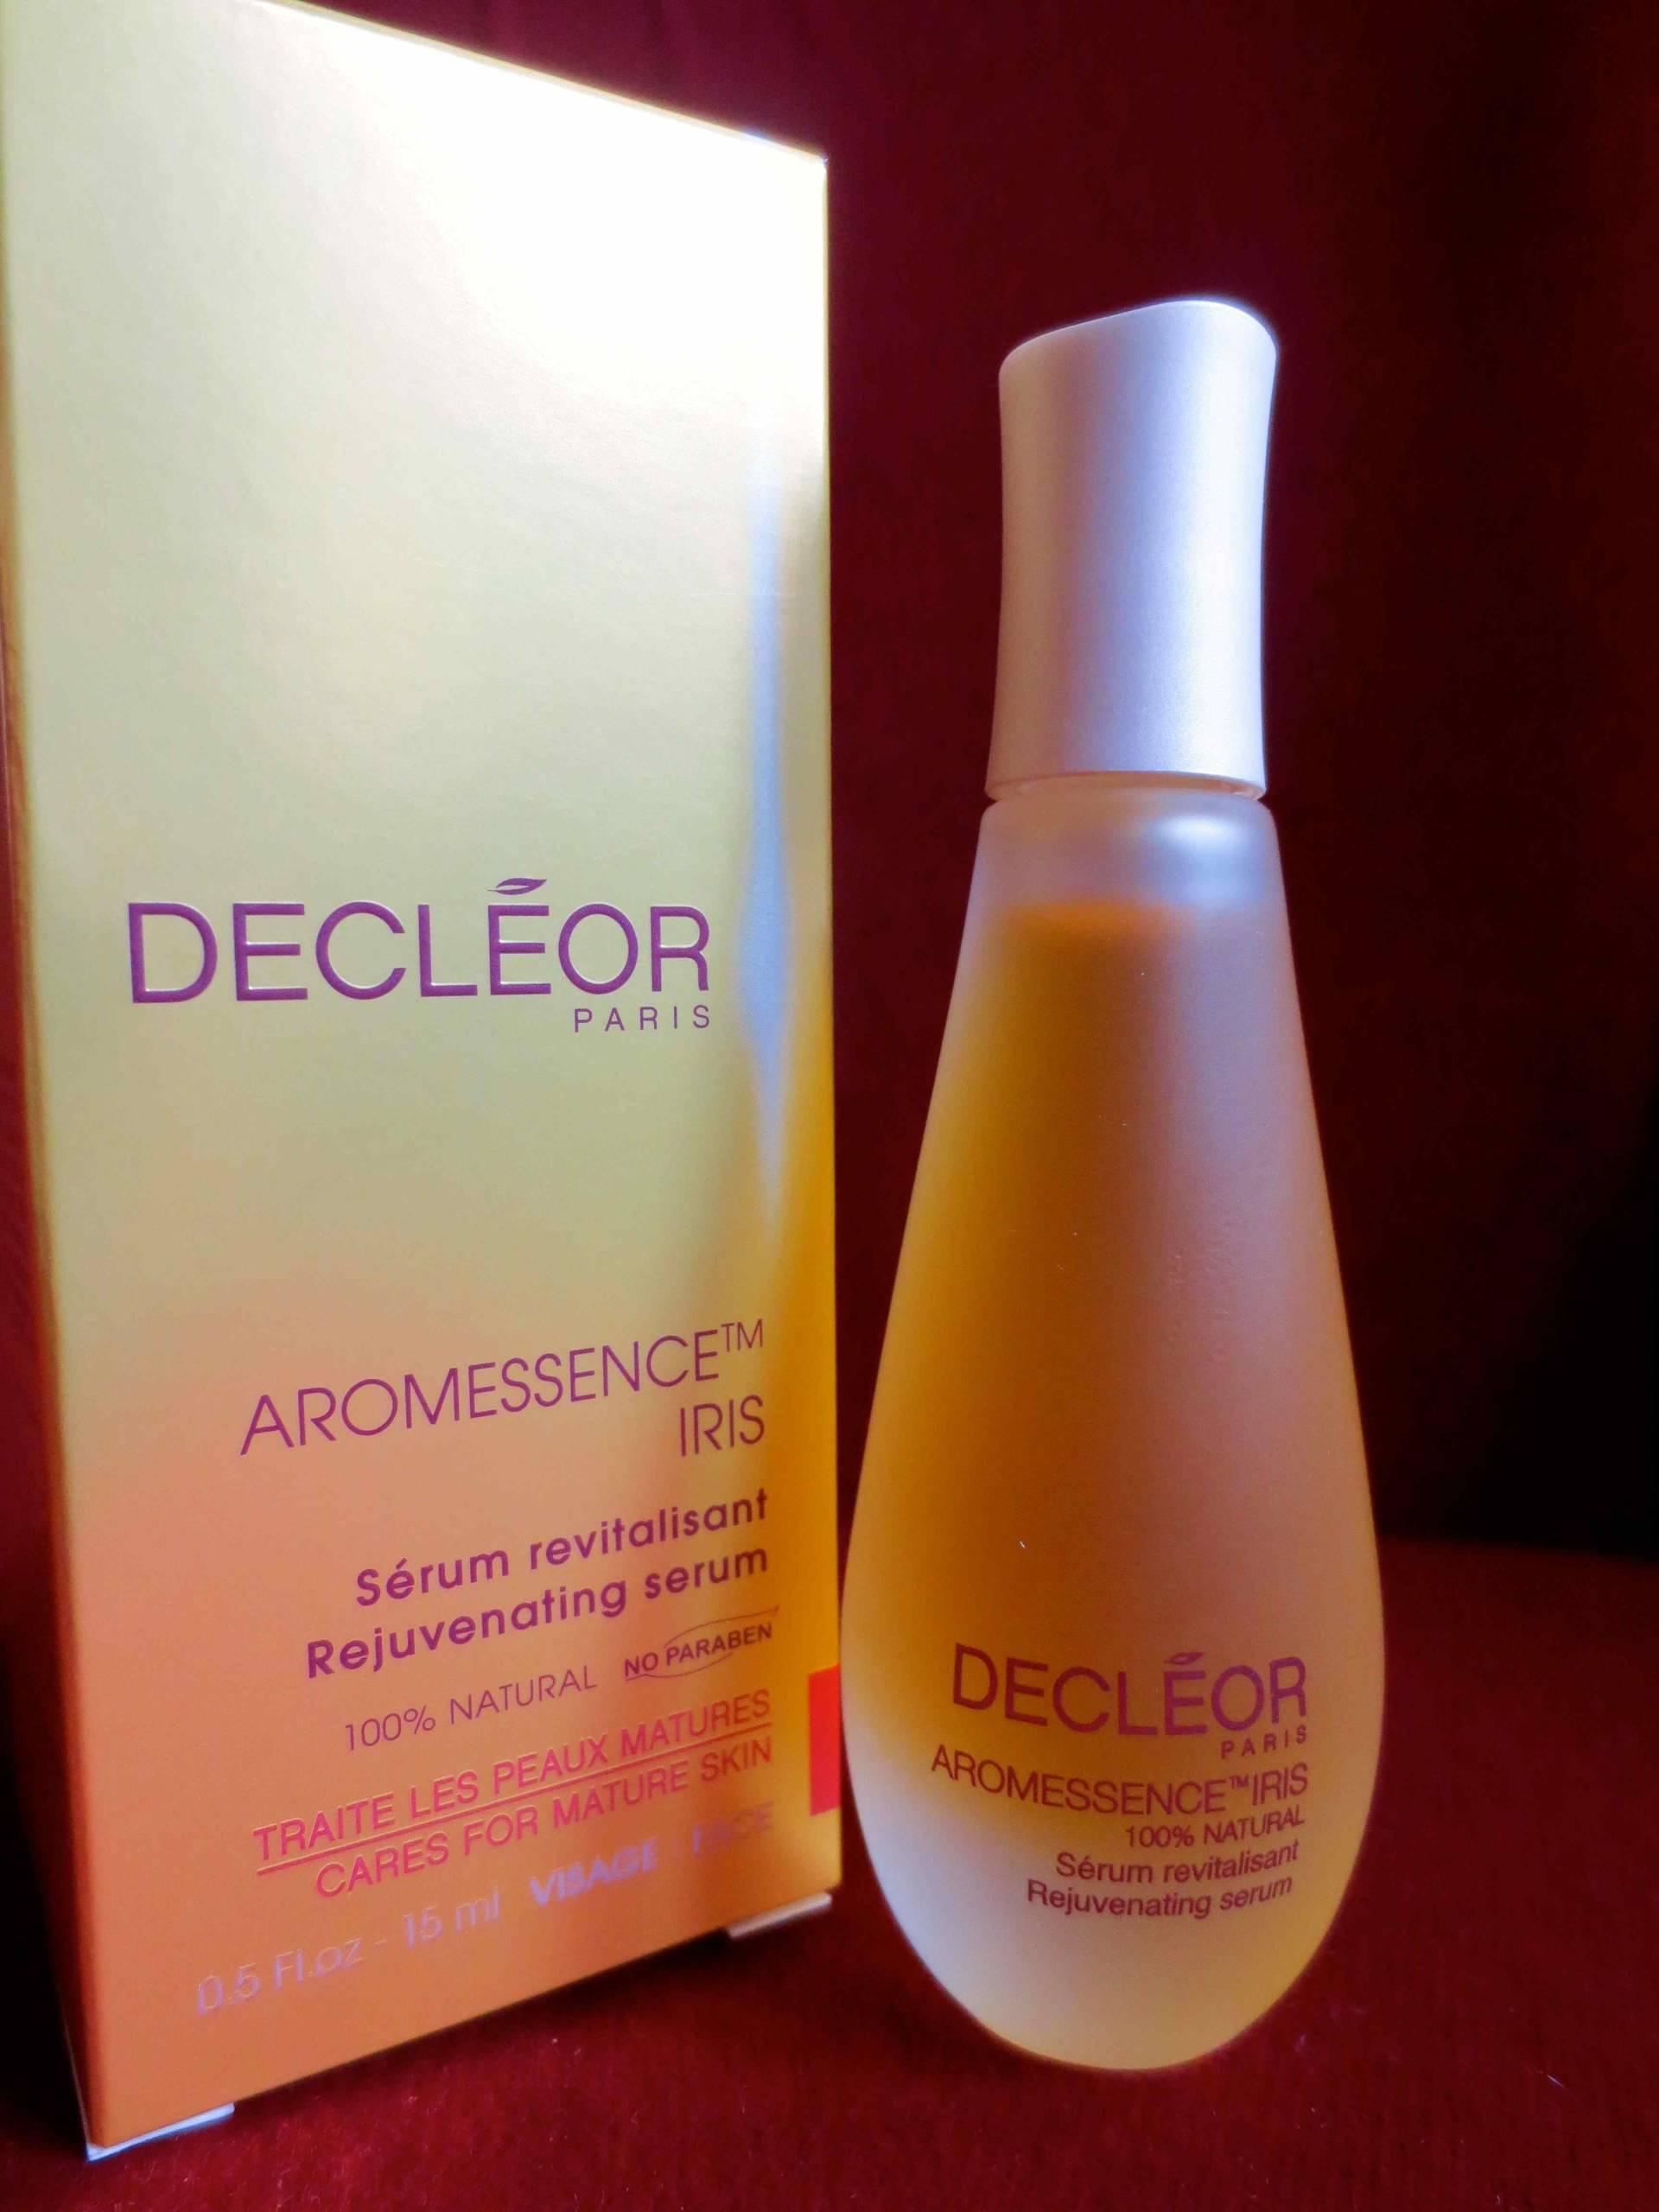 wondrous oil - Decléor Aromessence Iris